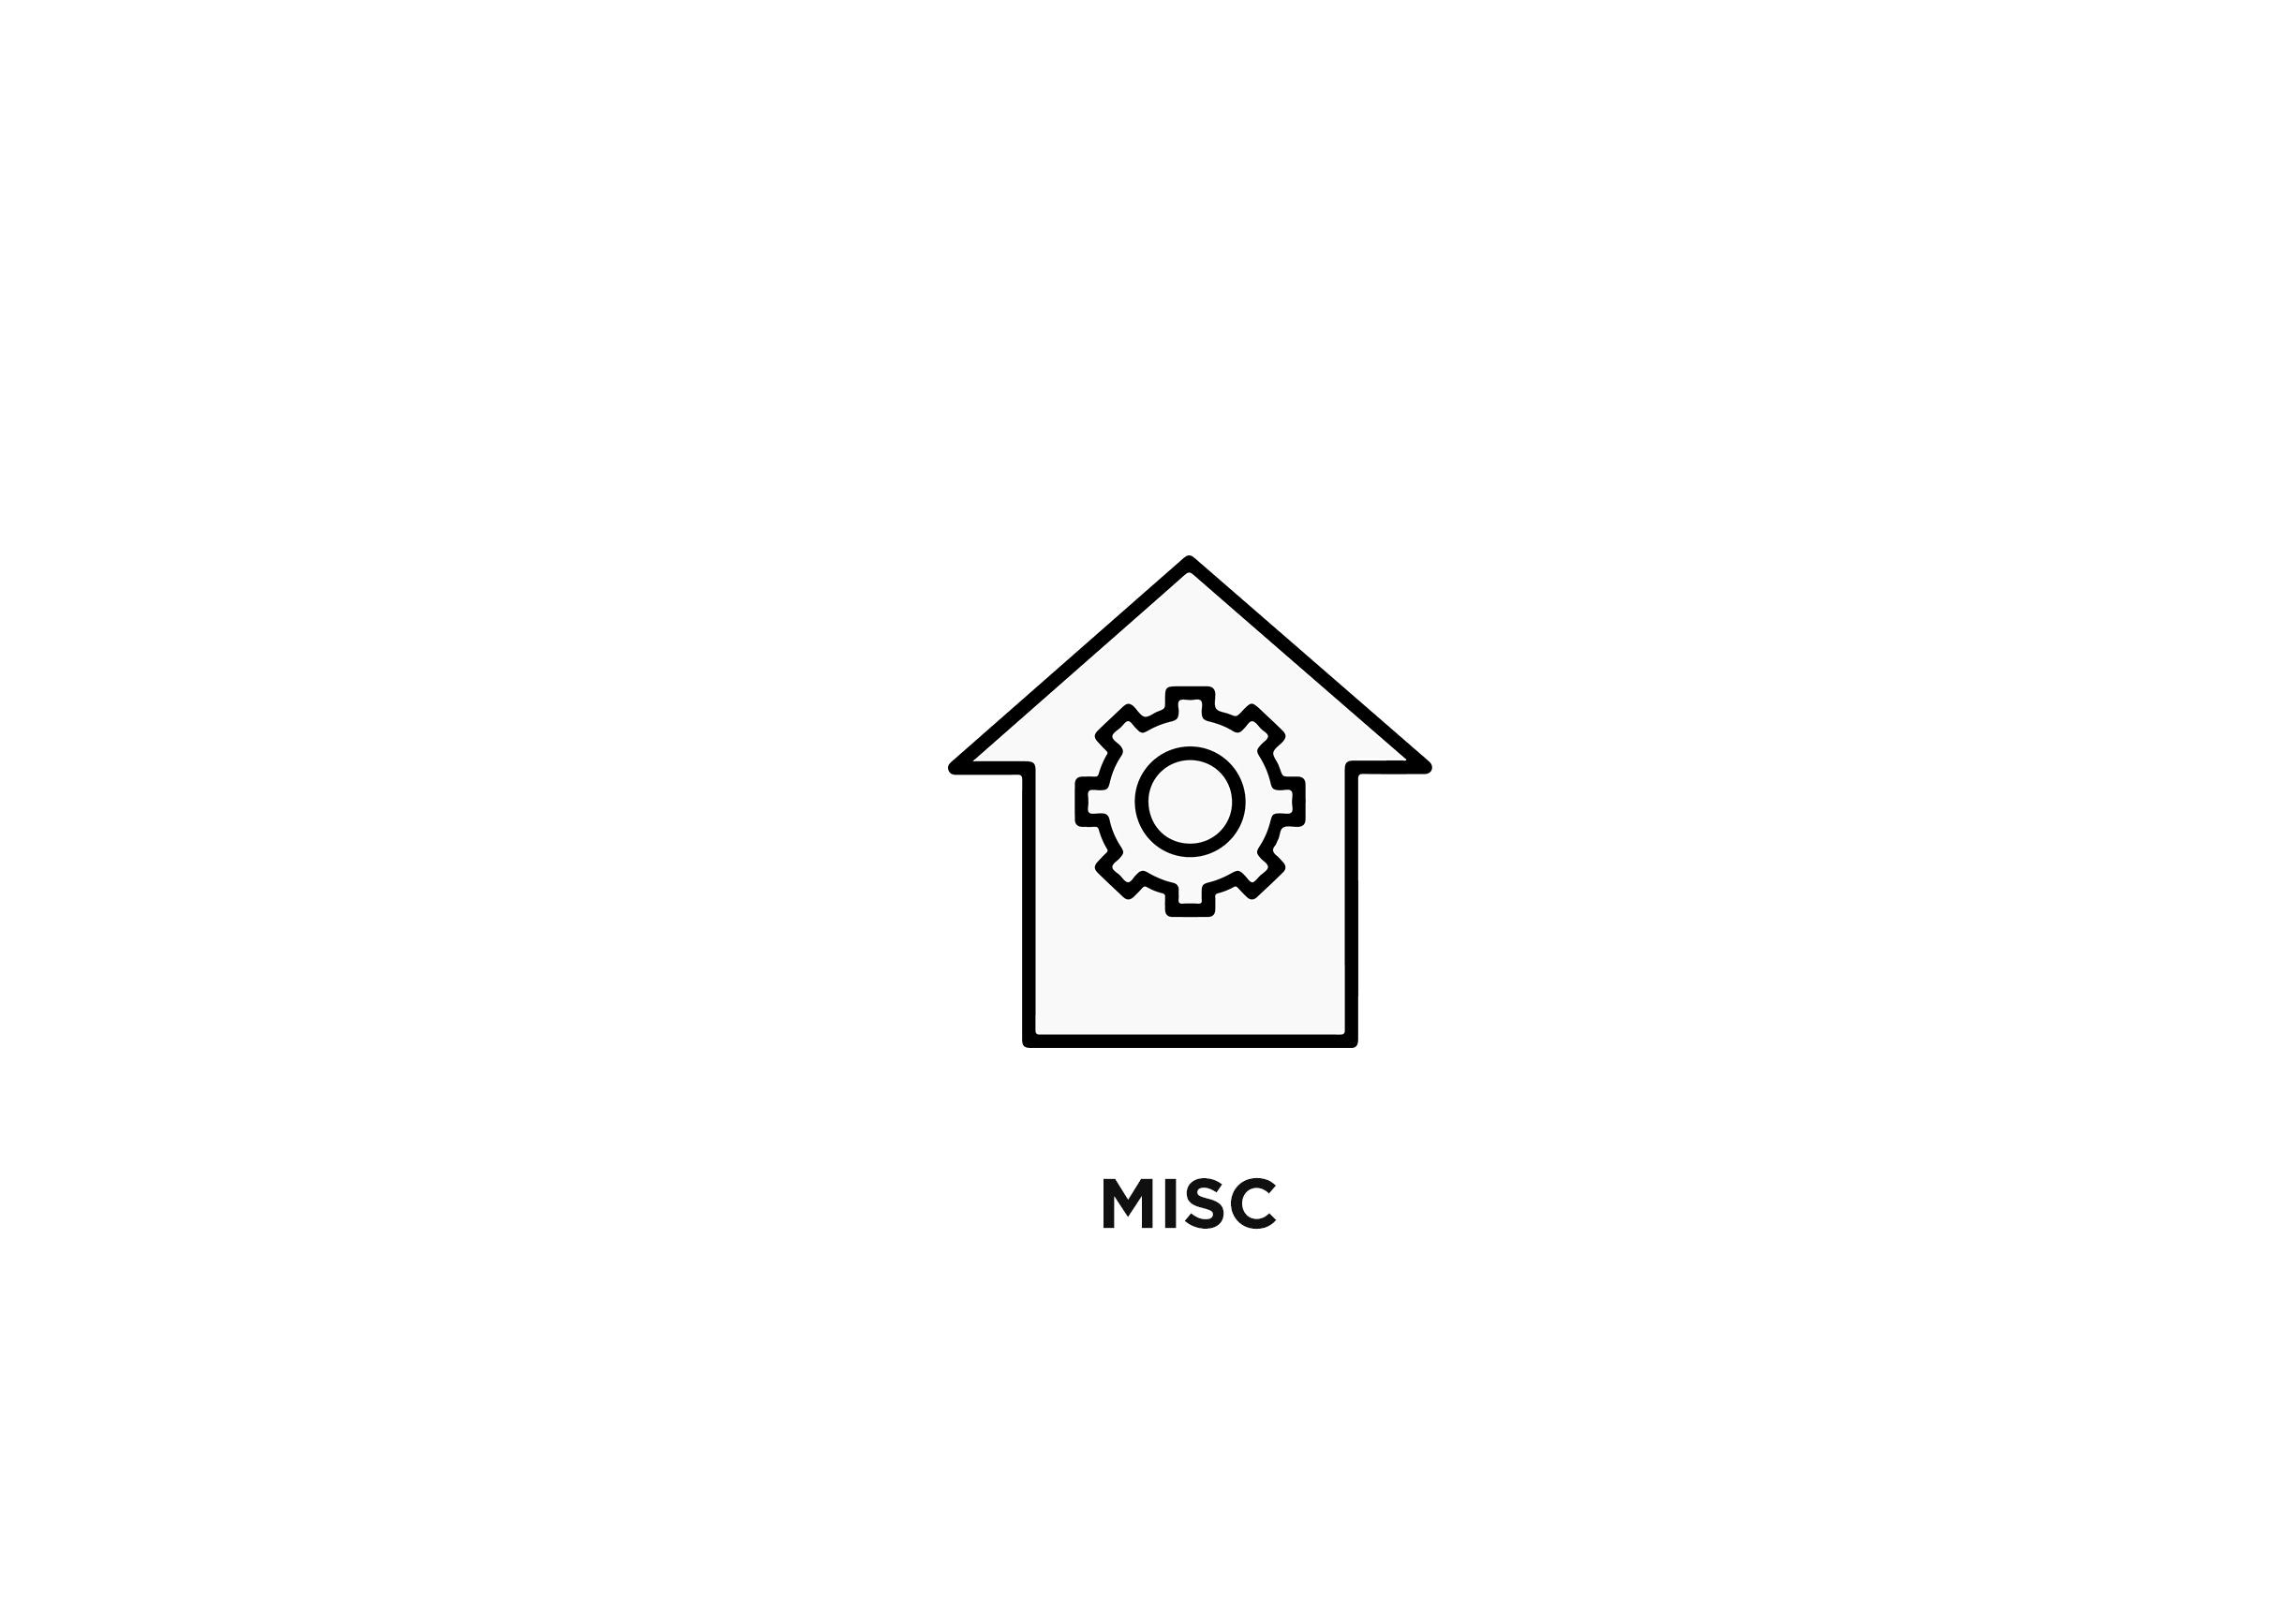 miscforweb.jpg